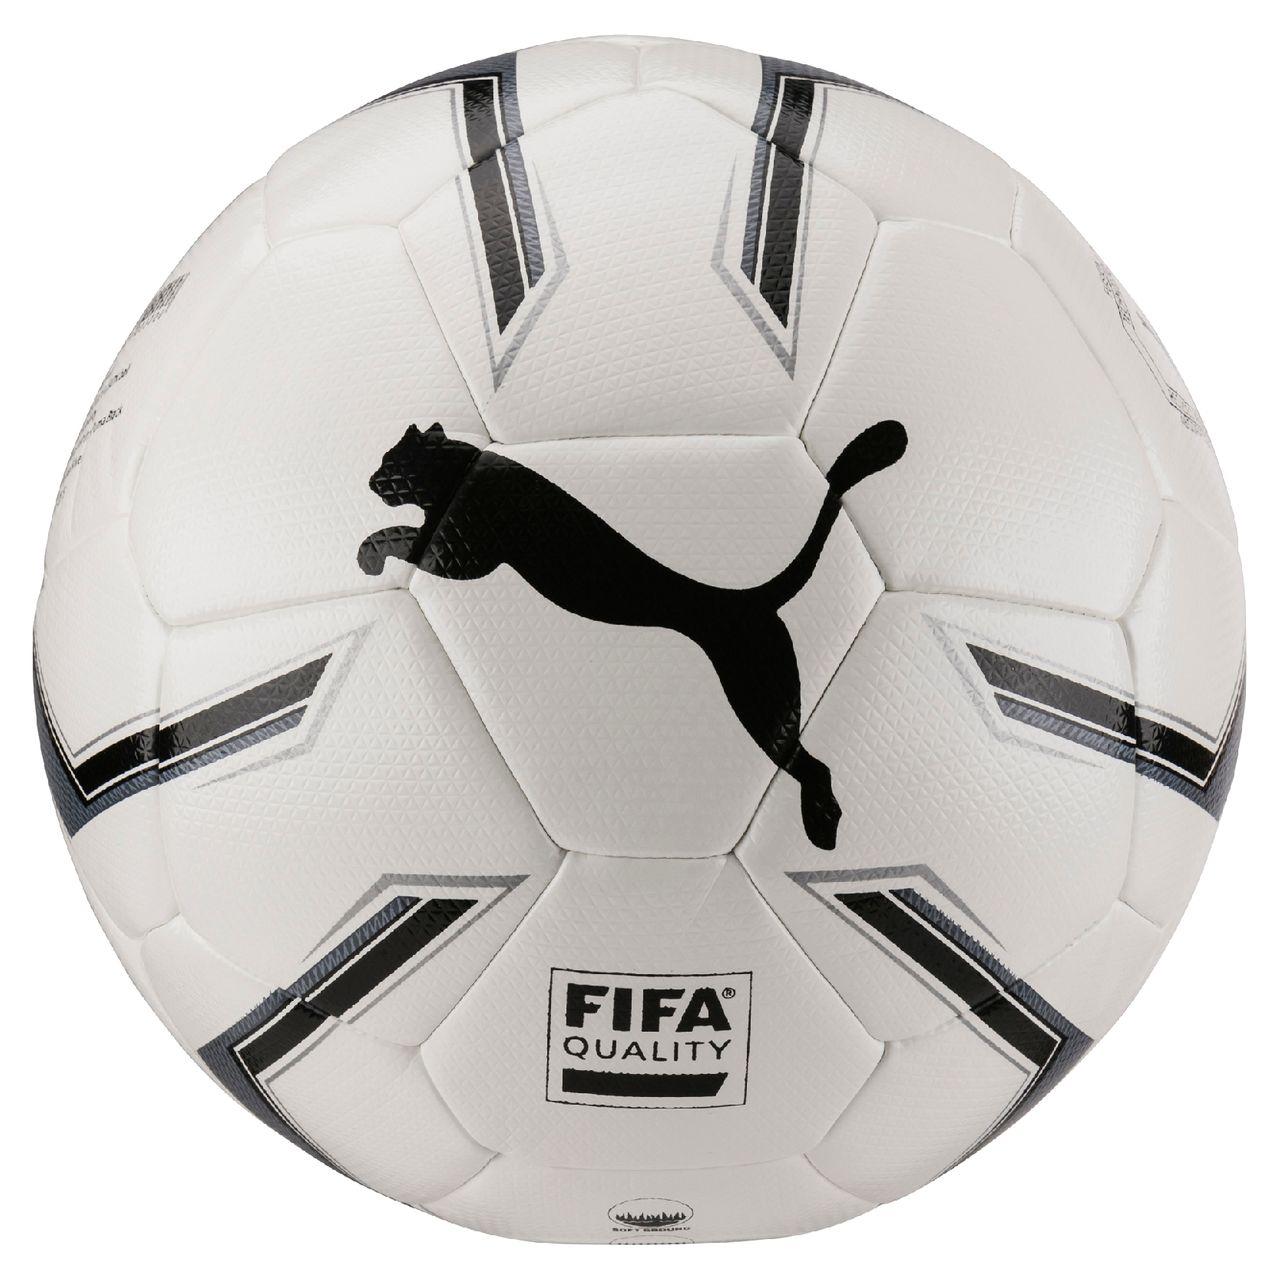 PUMA Spielball - ELITE 2.2 FUSION